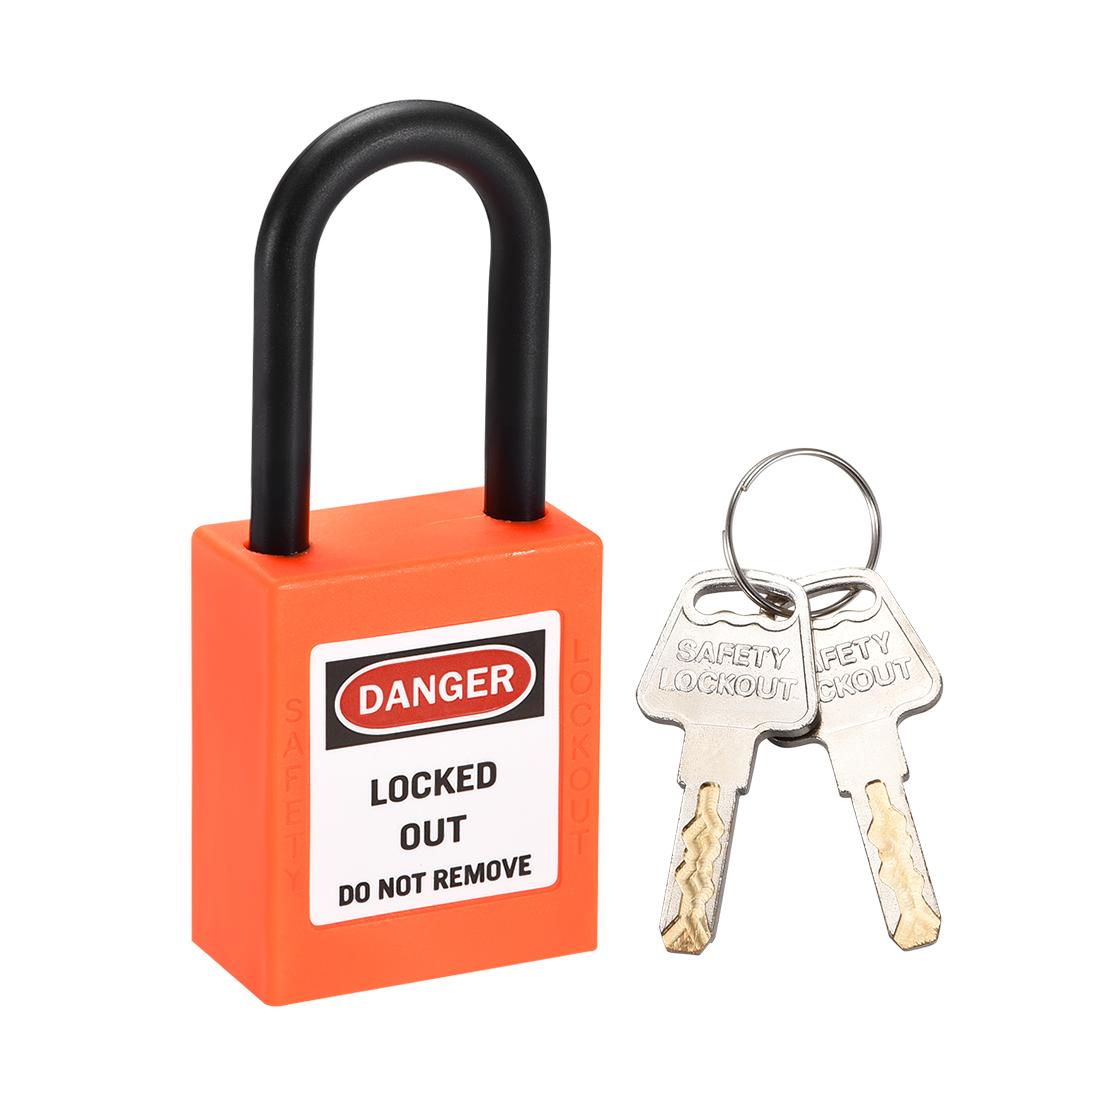 Lockout Tagout Locks, 1-1/2 Inch Shackle Key Different Safety Padlock Orange